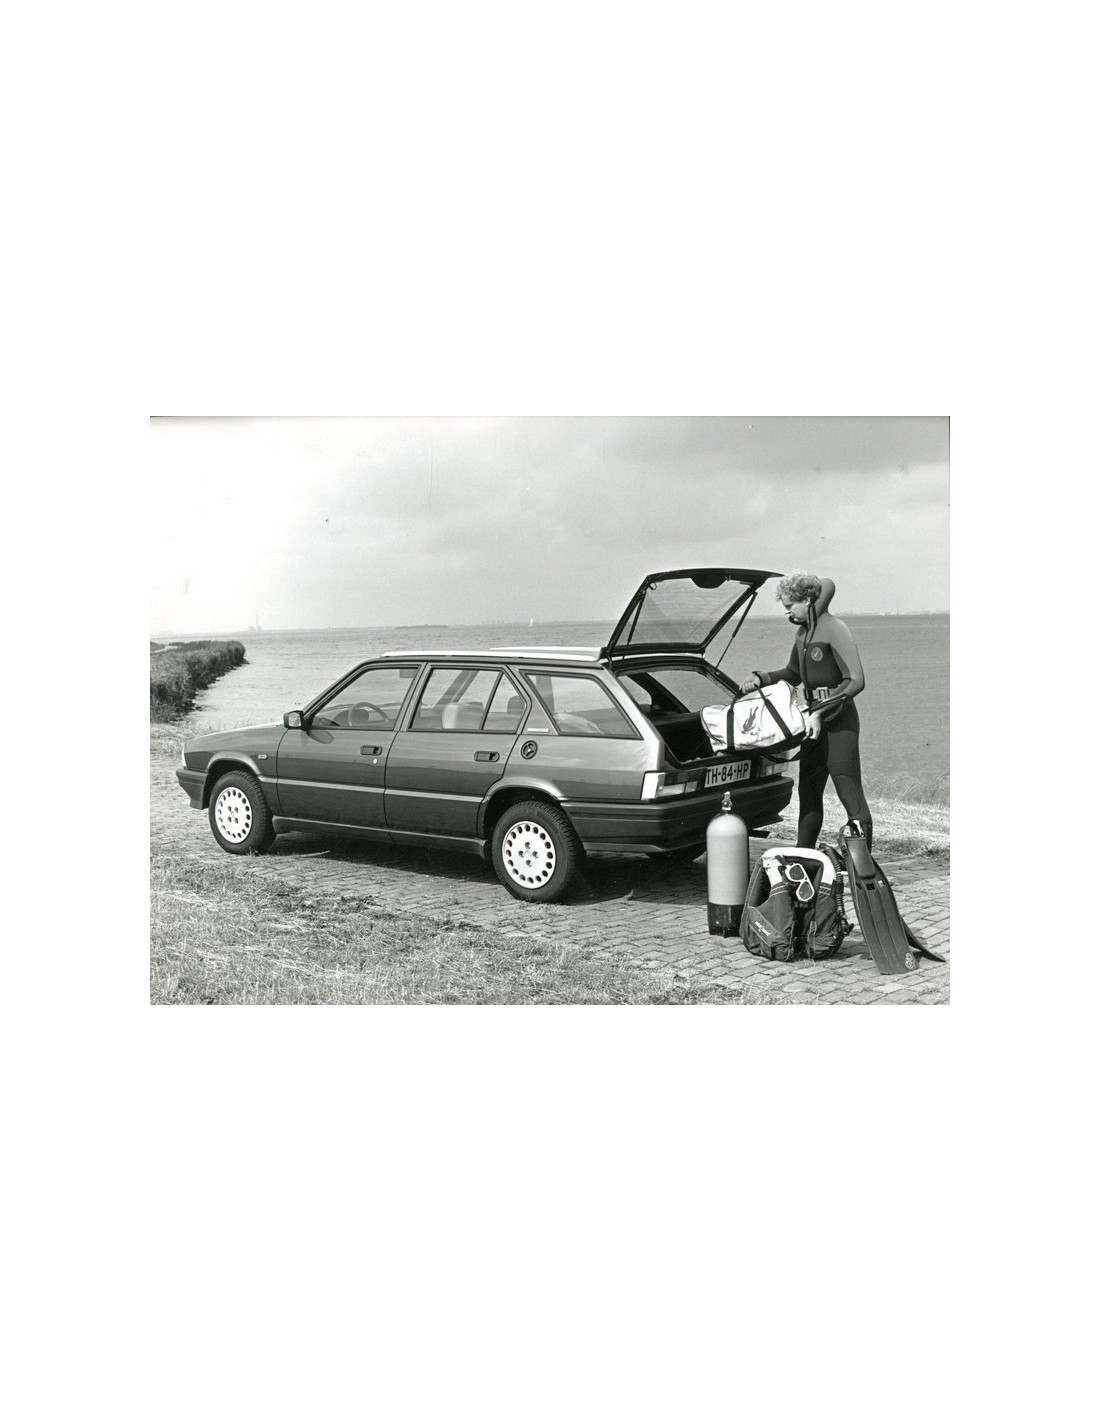 1989 ALFA ROMEO 33 SPORT WAGON PRESS PHOTO